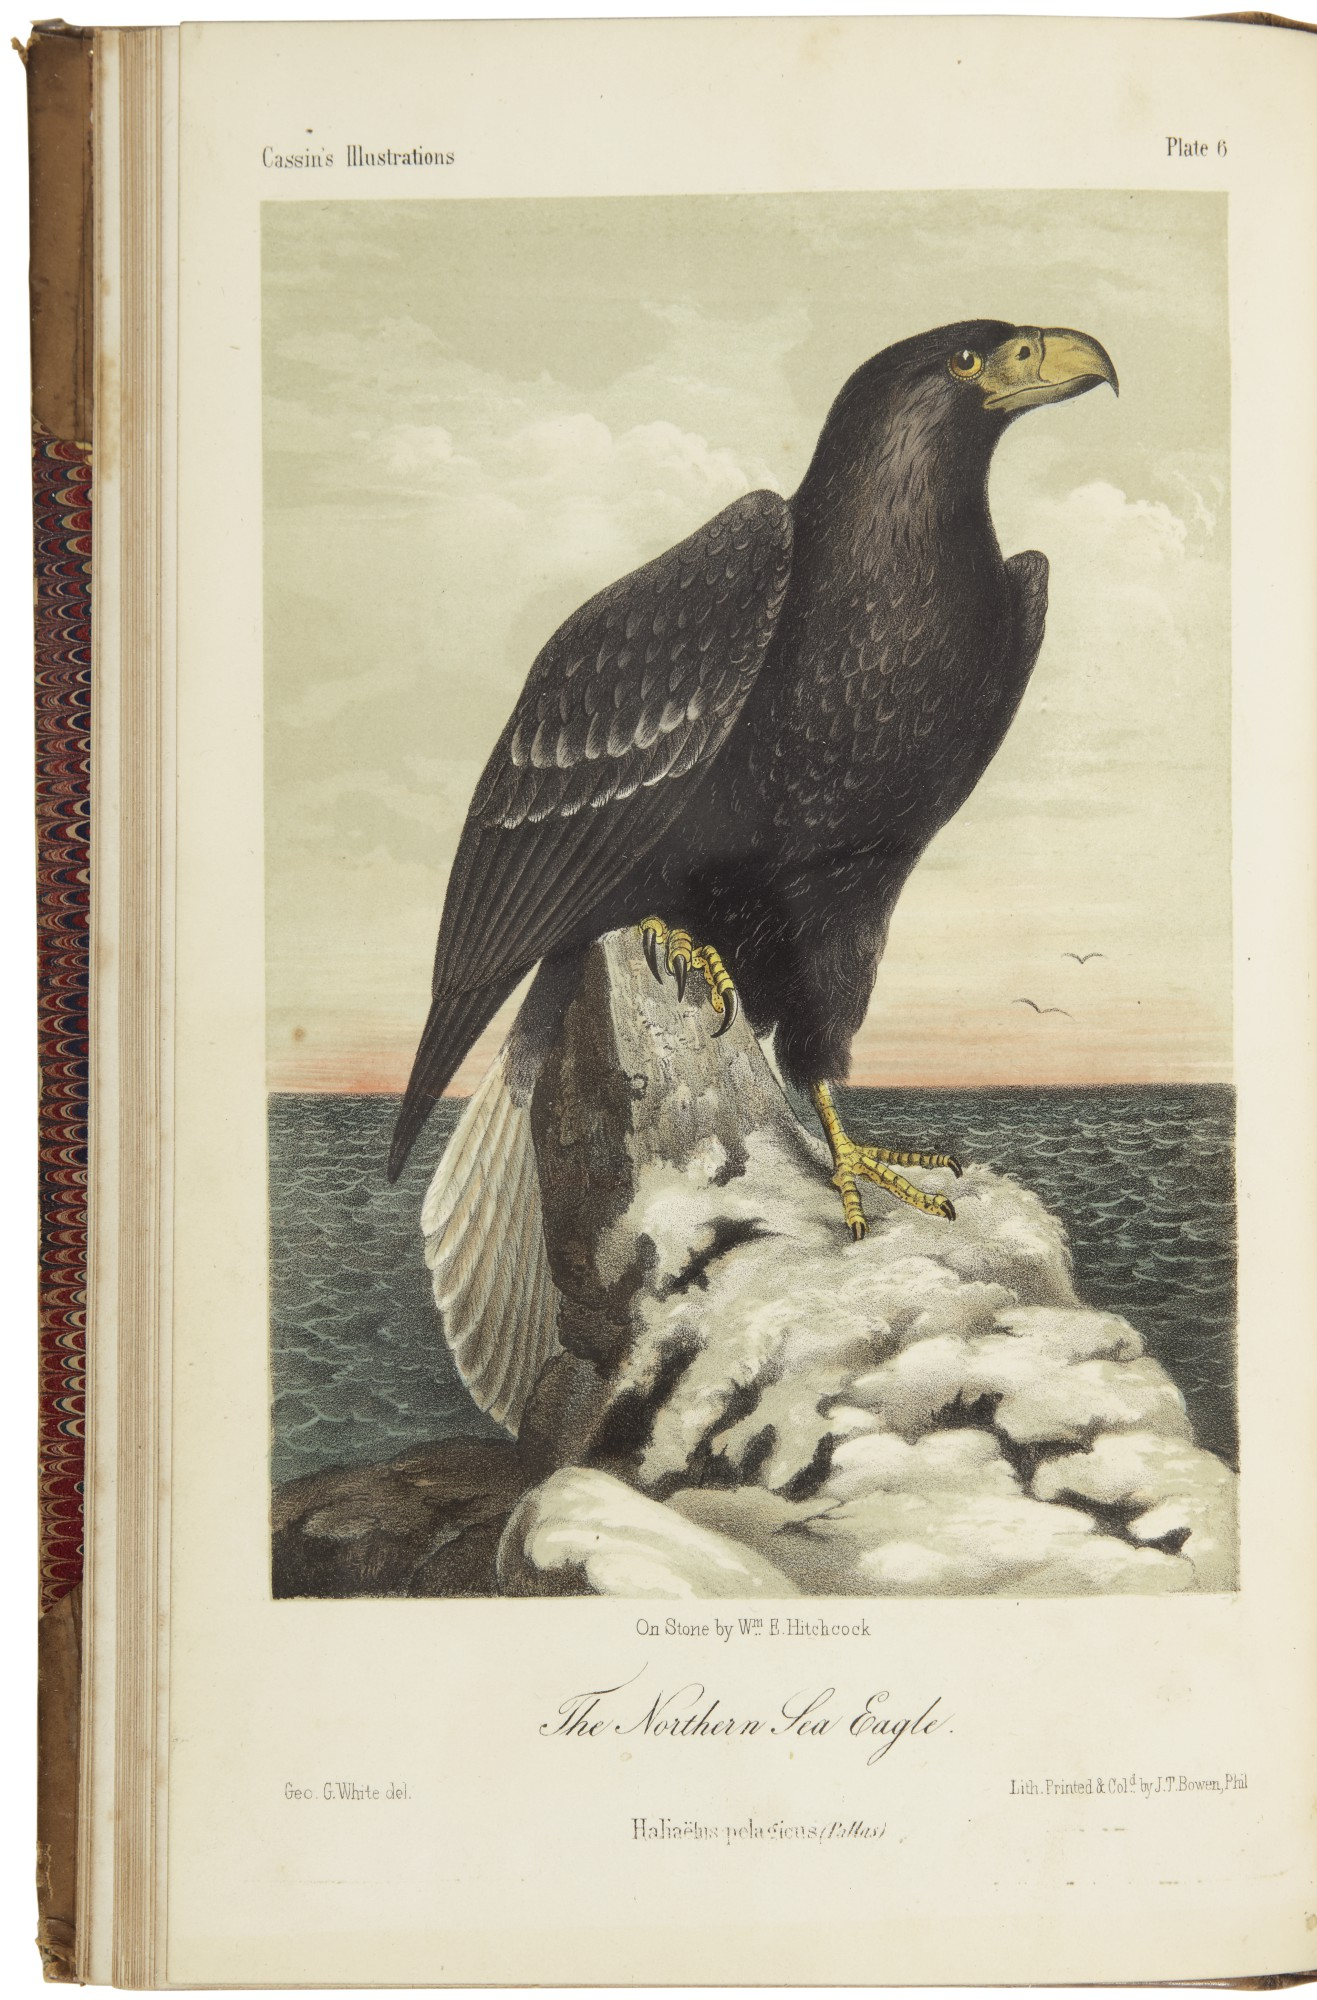 Cassin John Illustrations Of The Birds Of California Texas Oregon Philadelphia 1853 1856 Fine Manuscript And Printed Americana Books Manuscripts Sotheby S